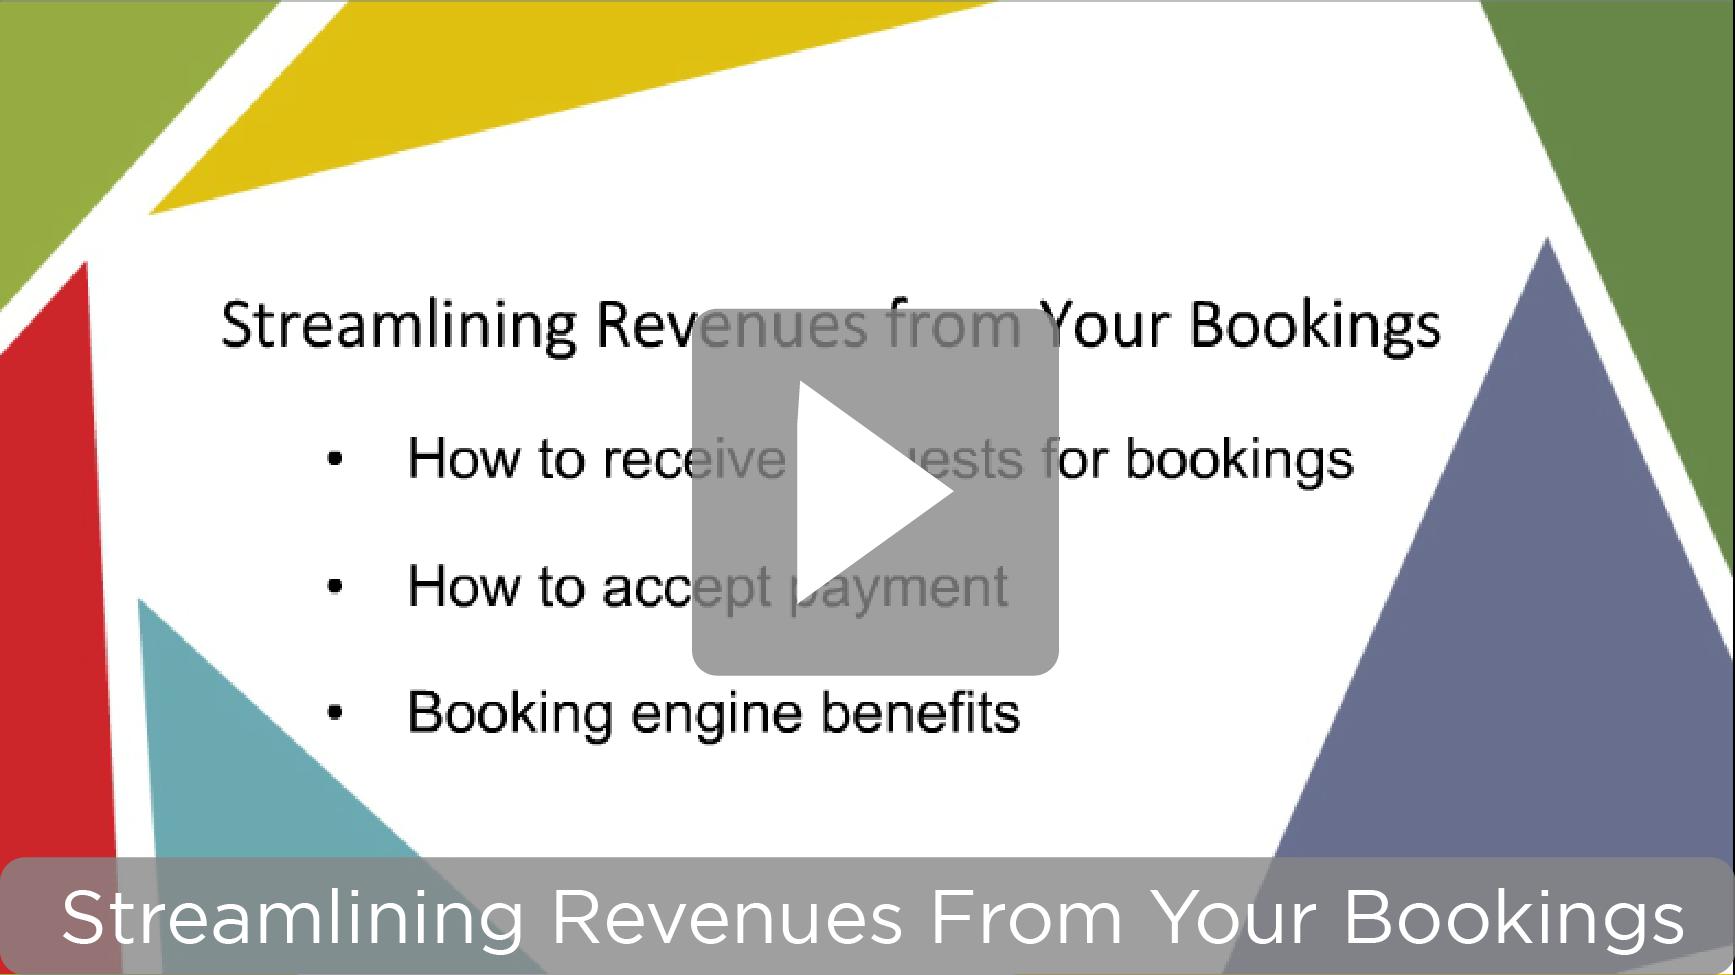 Video link – Streamlining Revenues webinar